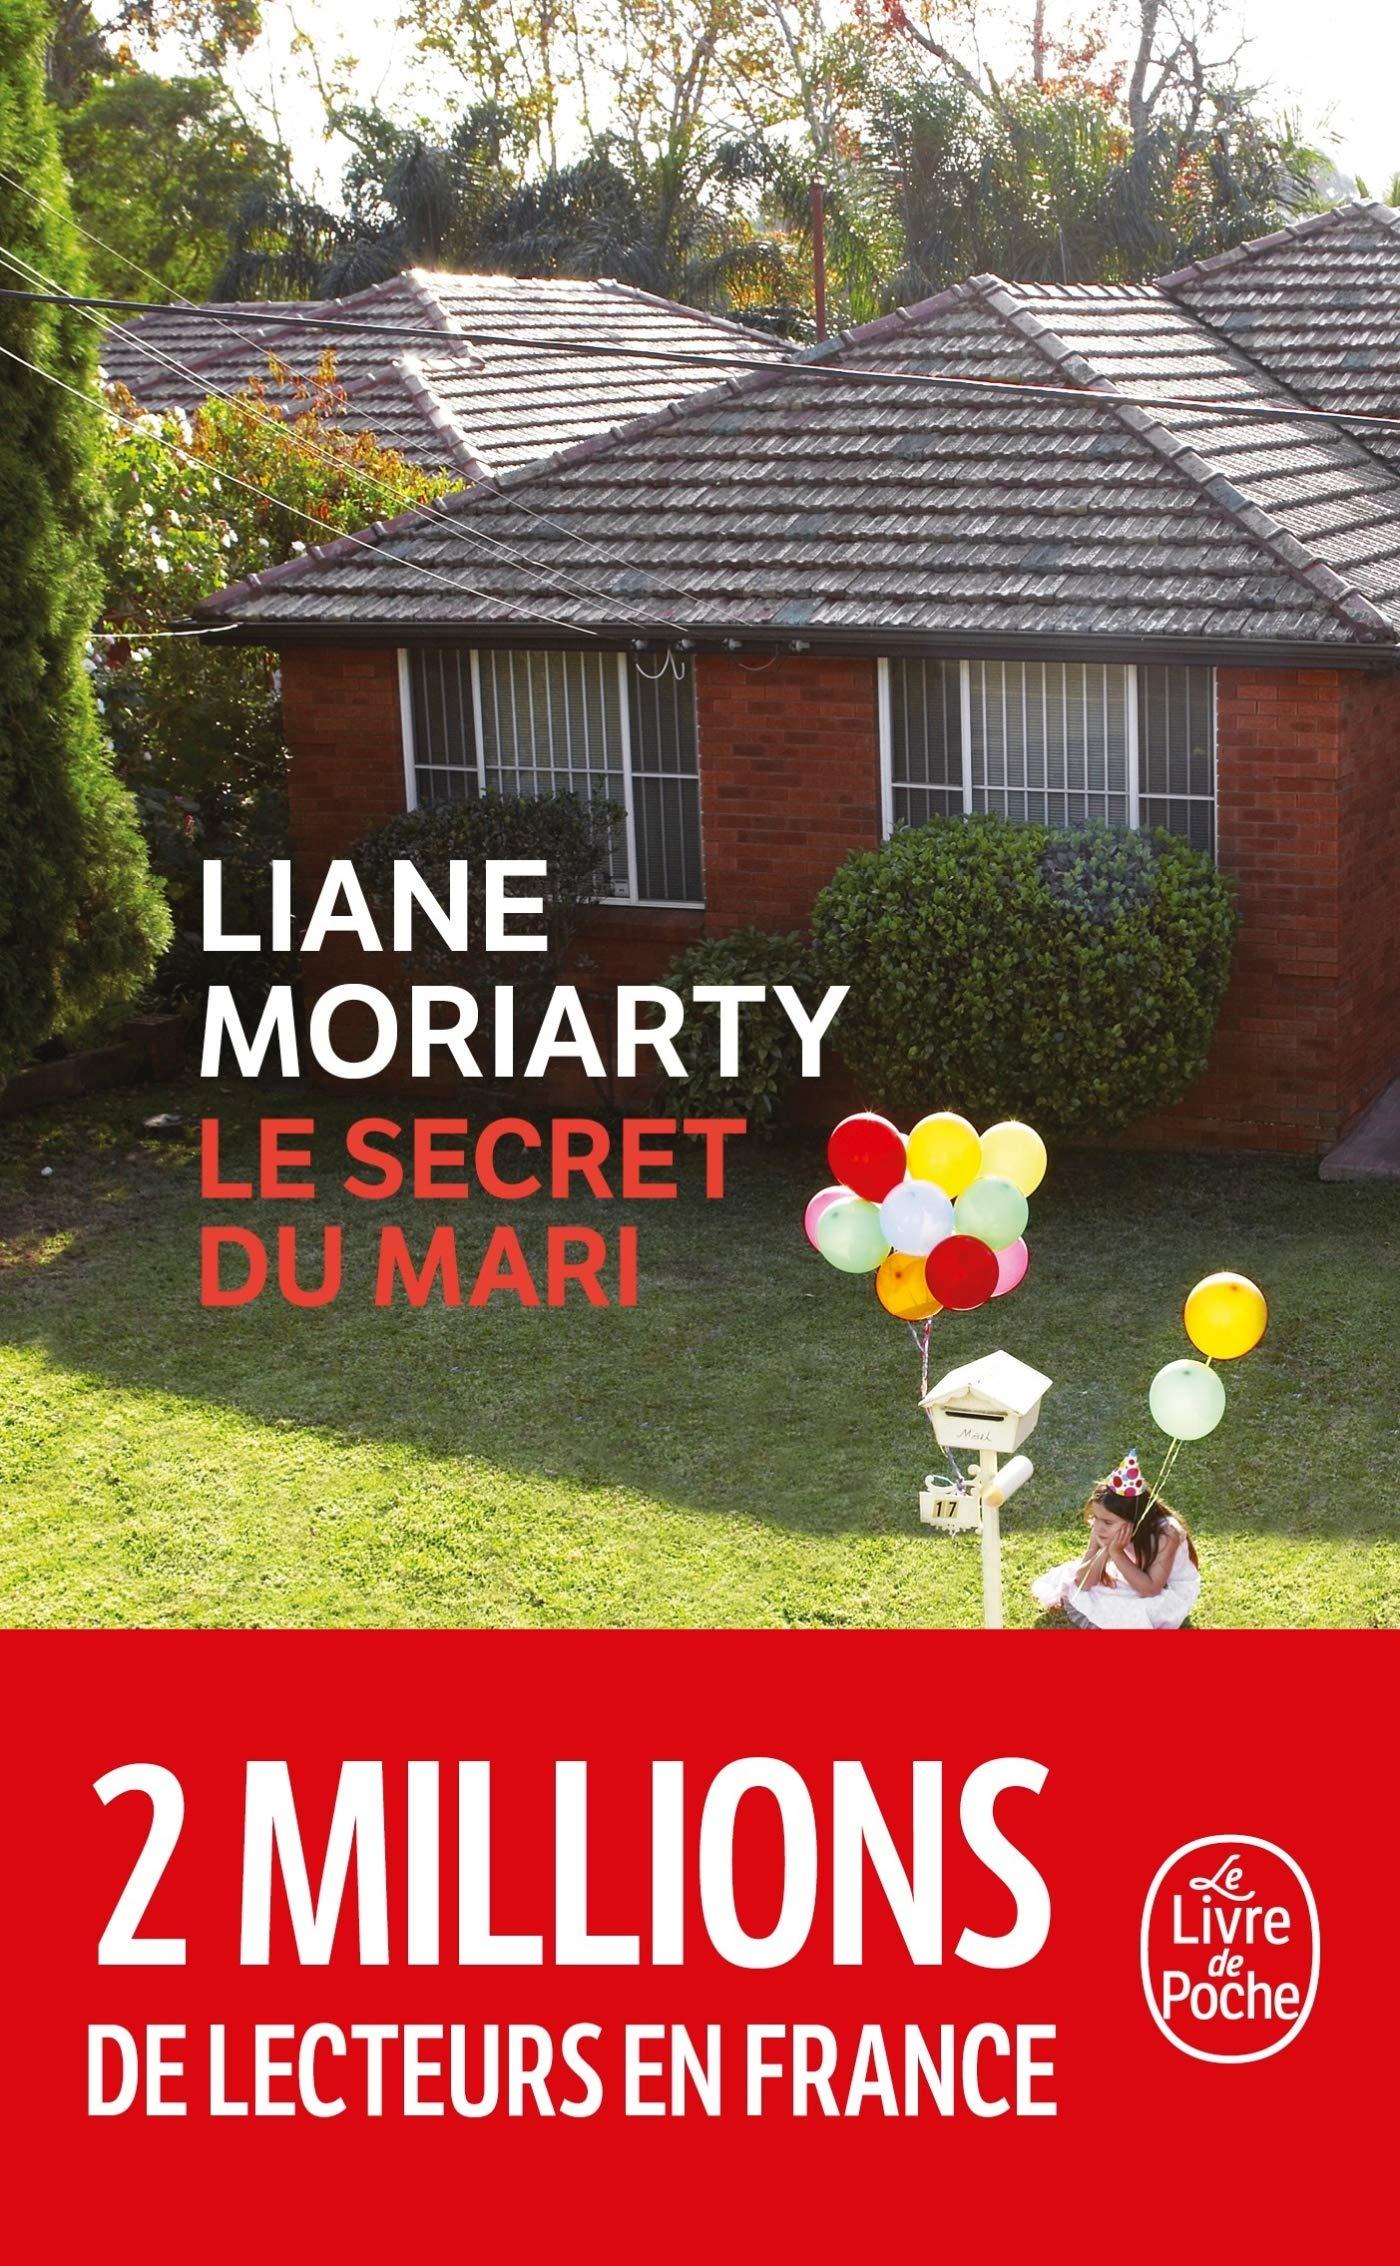 caceca9584c295 Amazon.fr - Le Secret du mari - Liane Moriarty - Livres